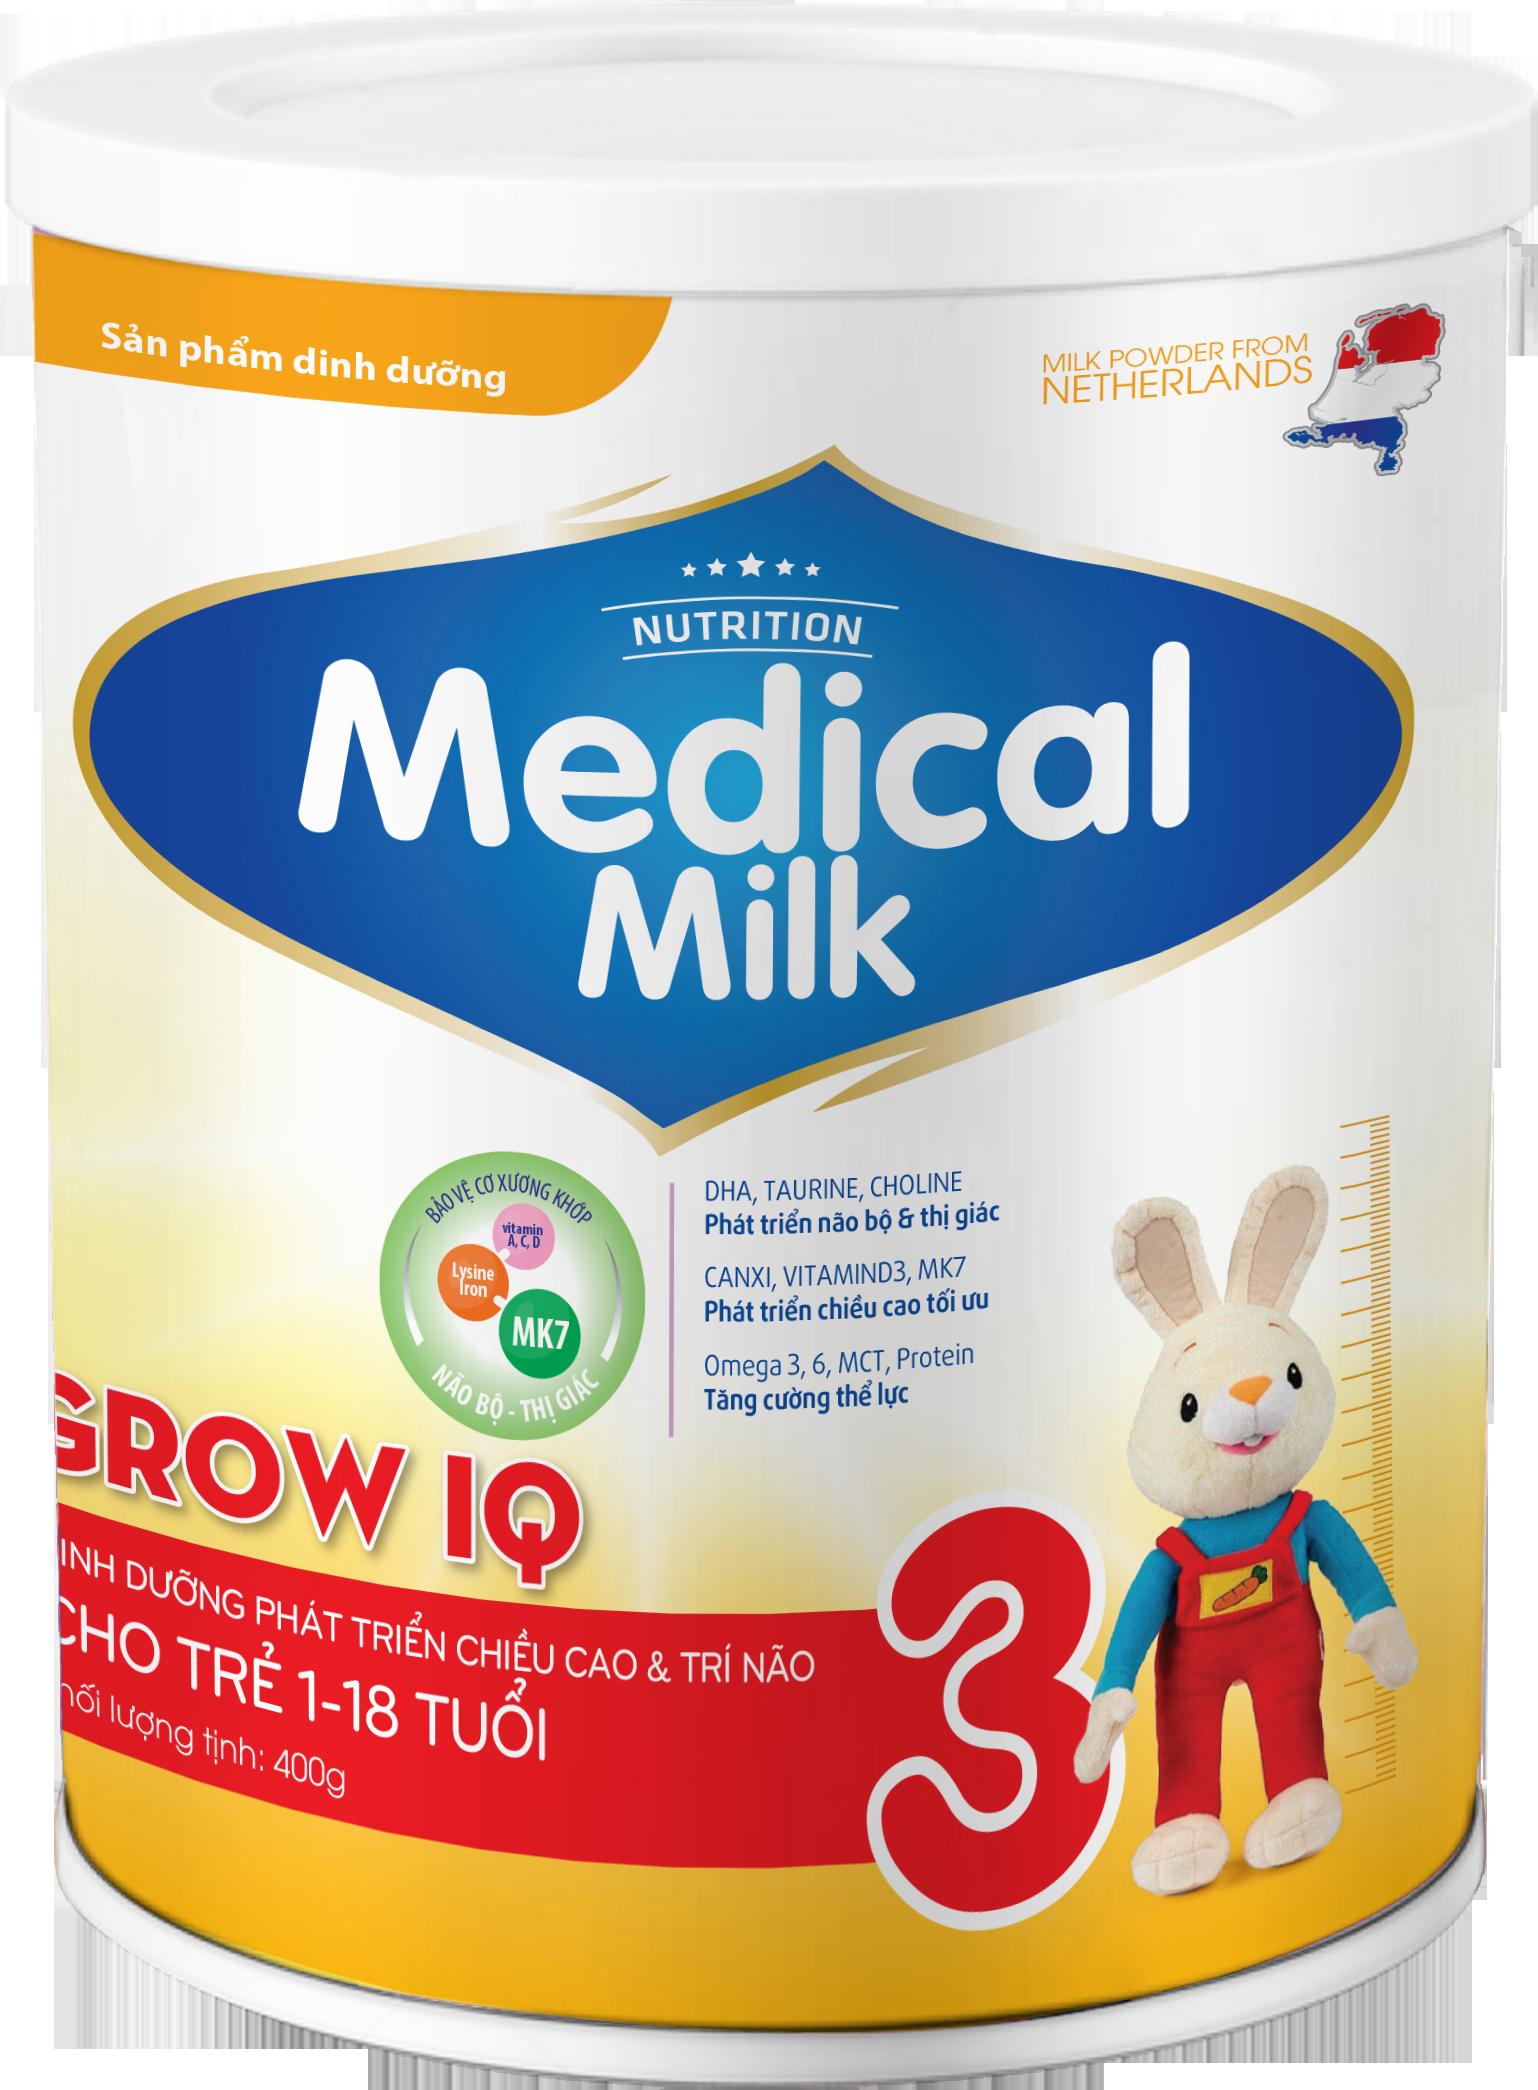 MEDICAL MILK GROW IQ 400g